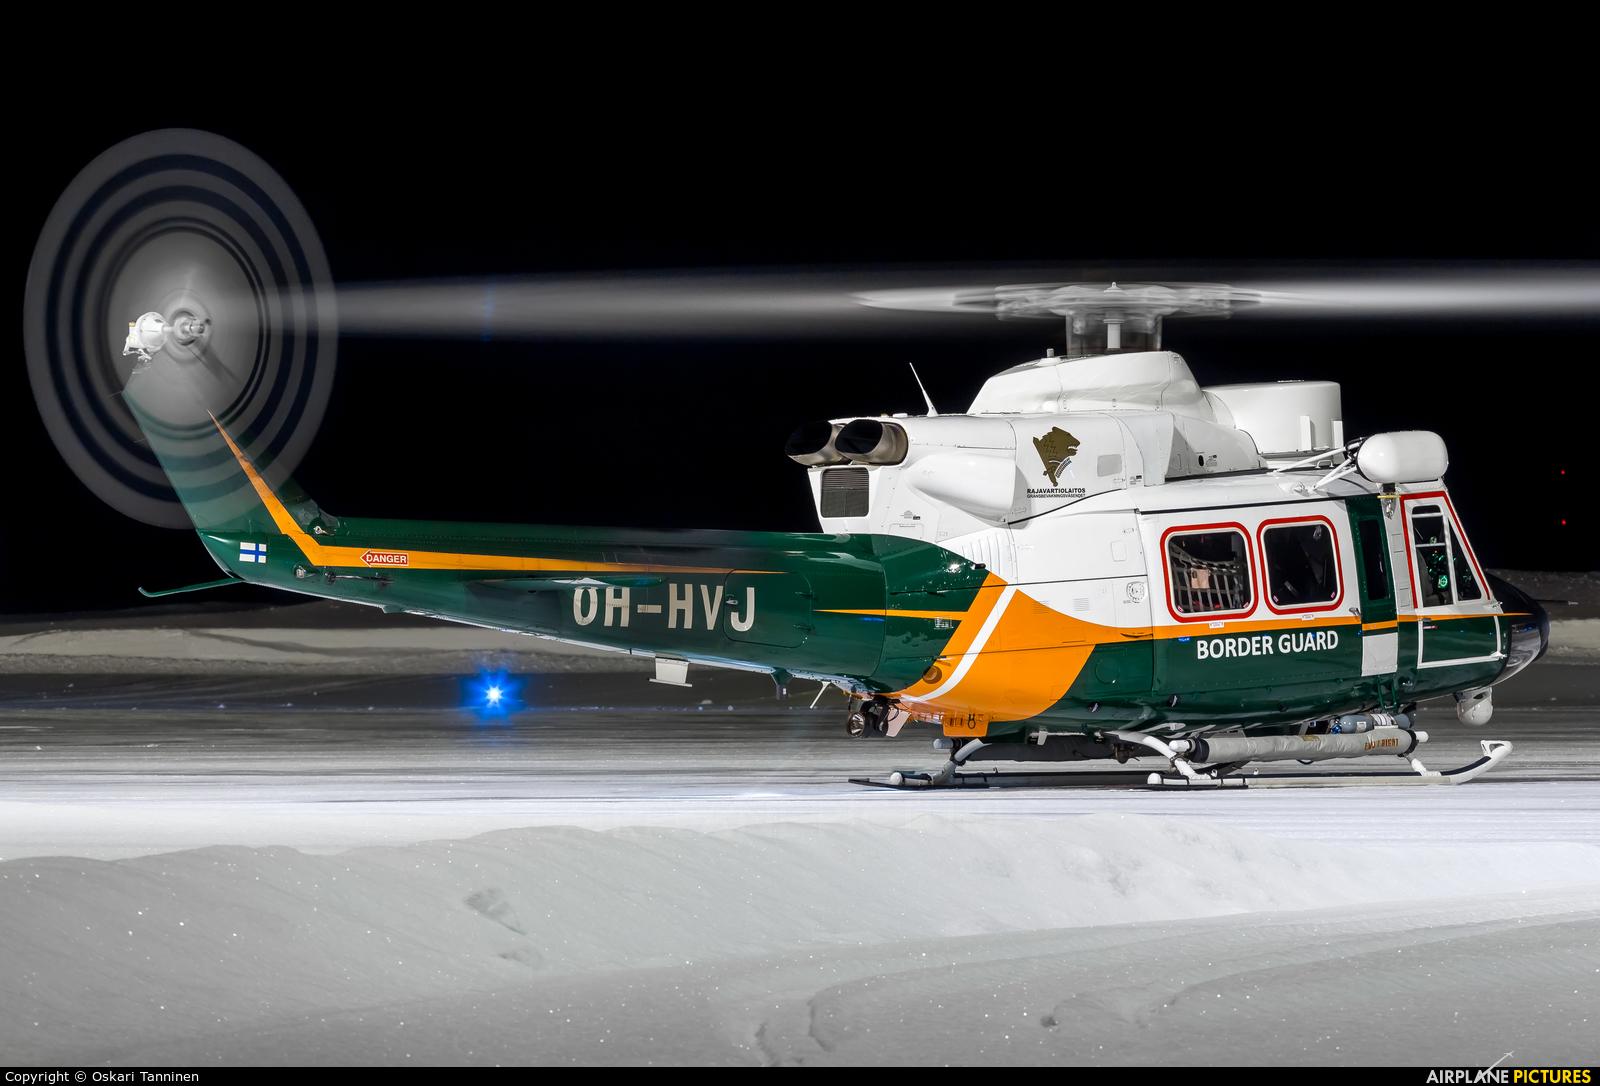 Finland - Border Guard OH-HVJ aircraft at Kittilä